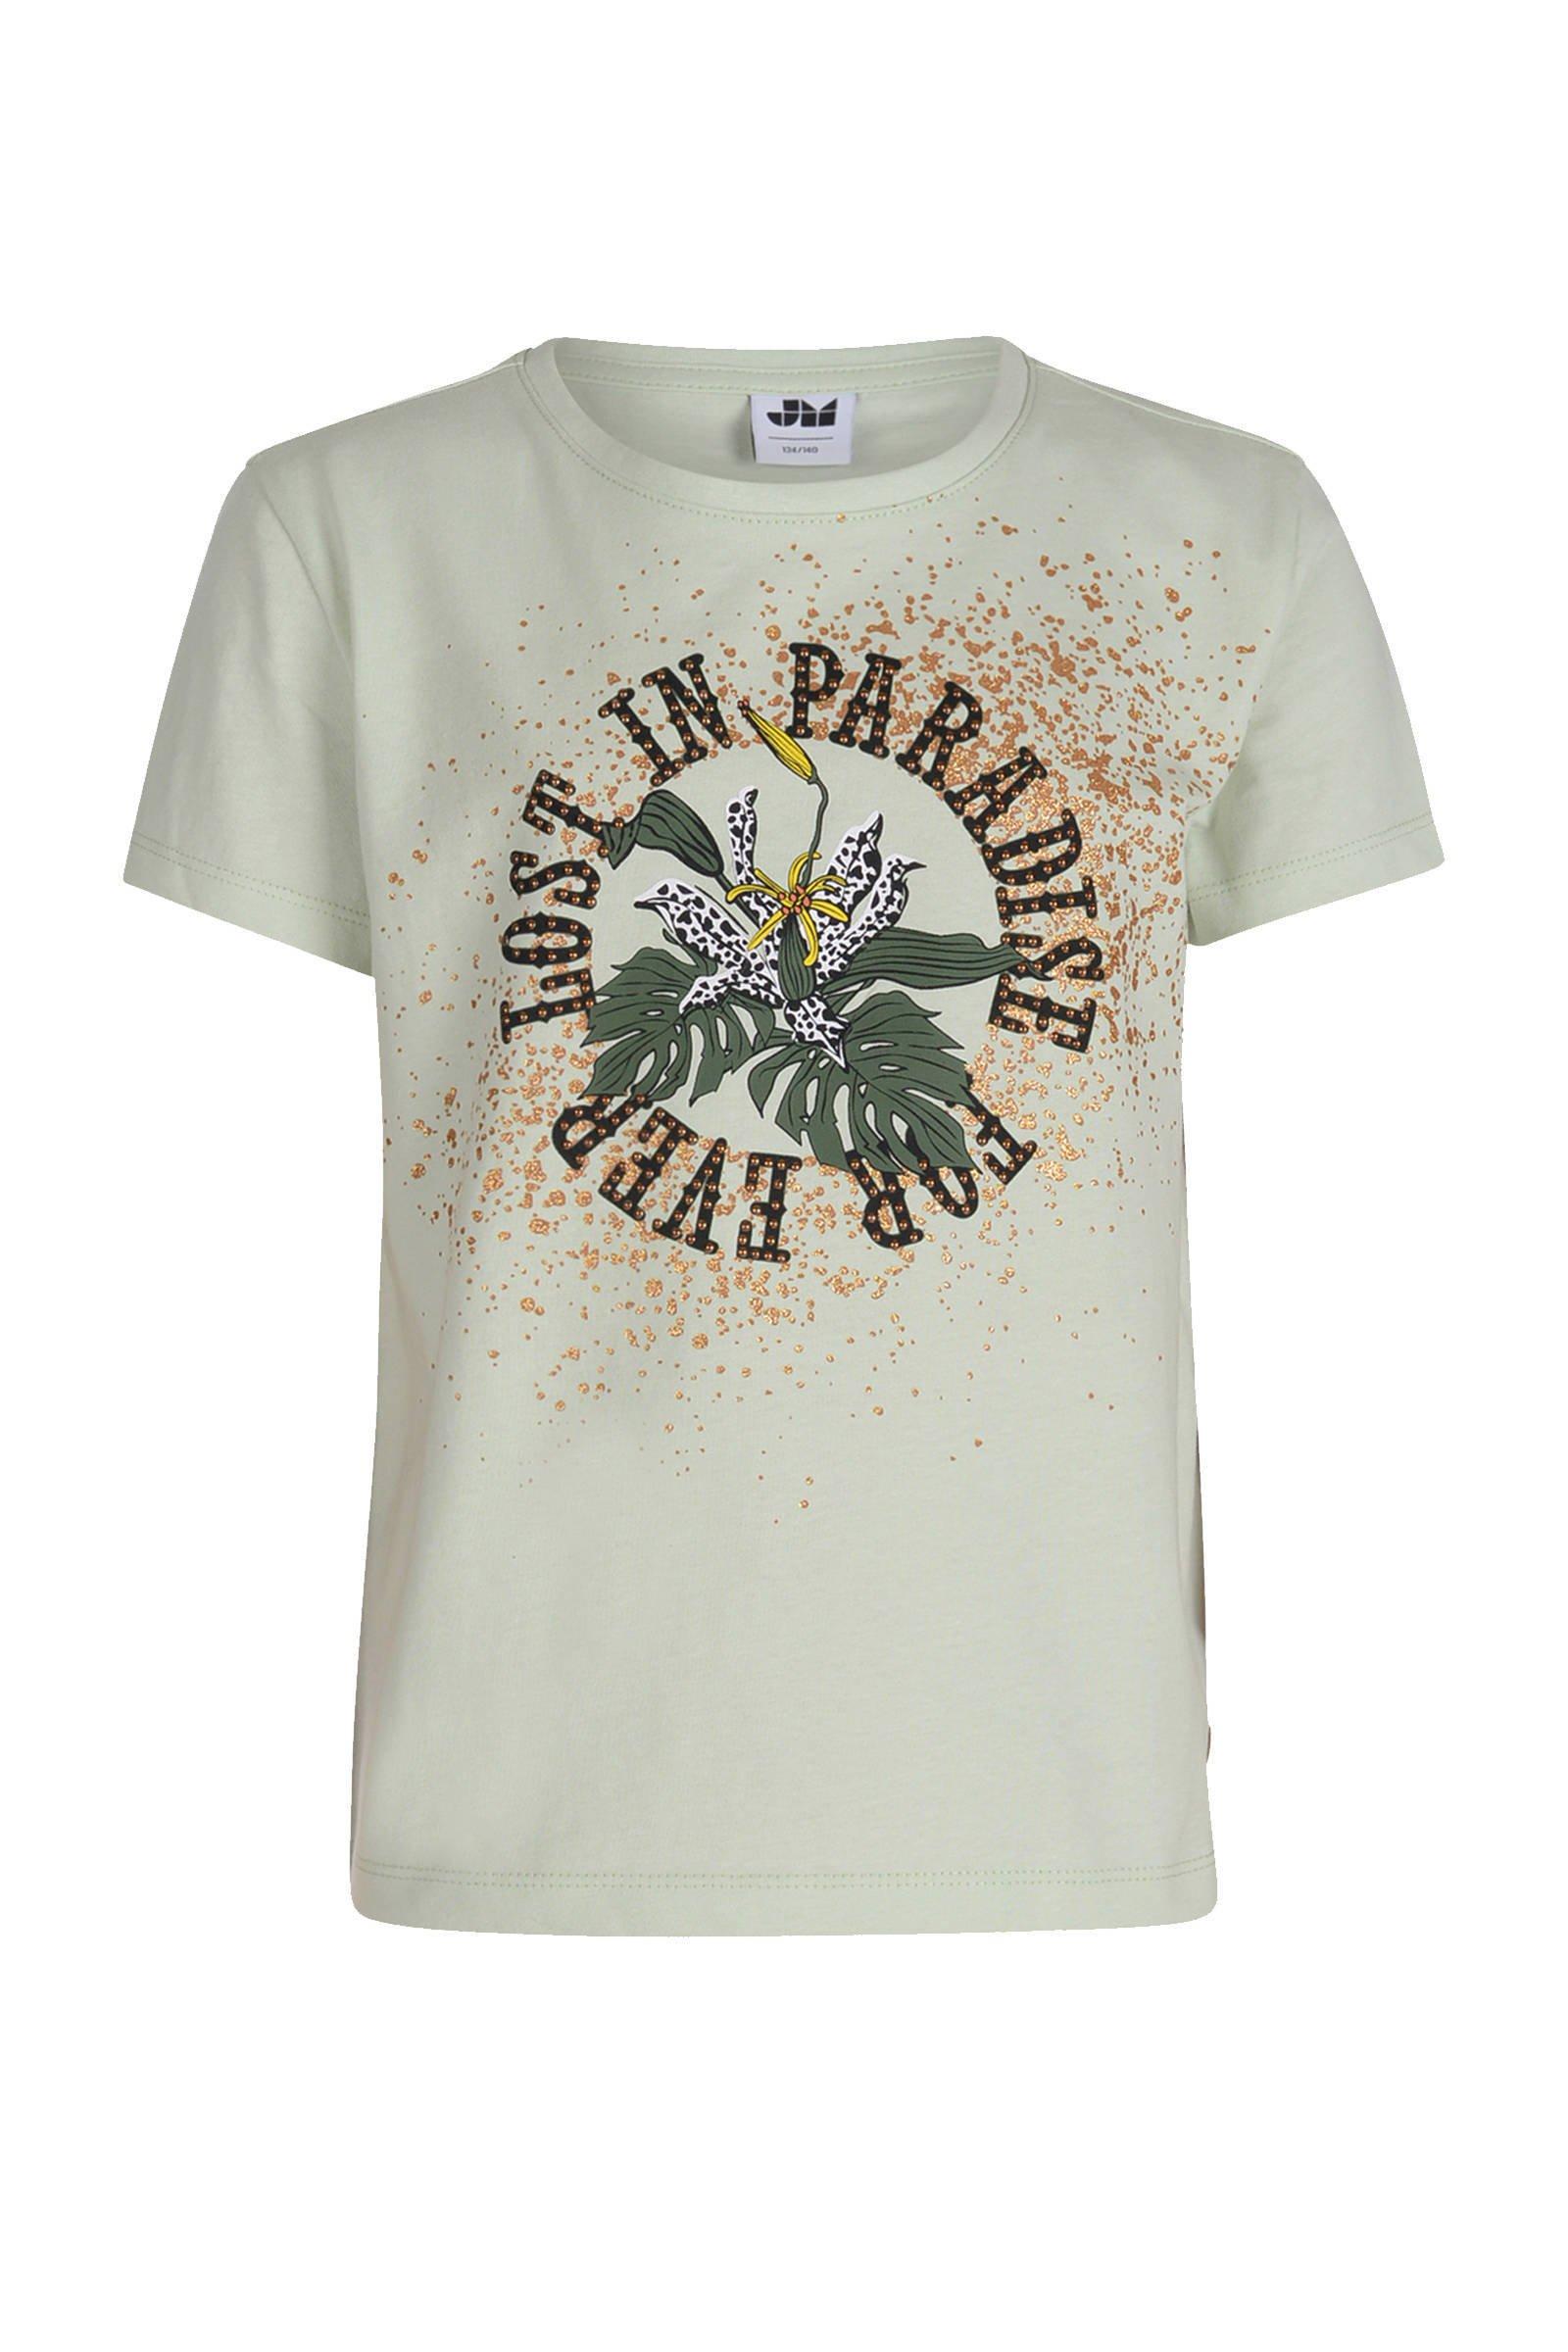 Jill & Mitch by Shoeby T-shirt Harmony met printopdruk lichtgroen/oranje - maat 170/176